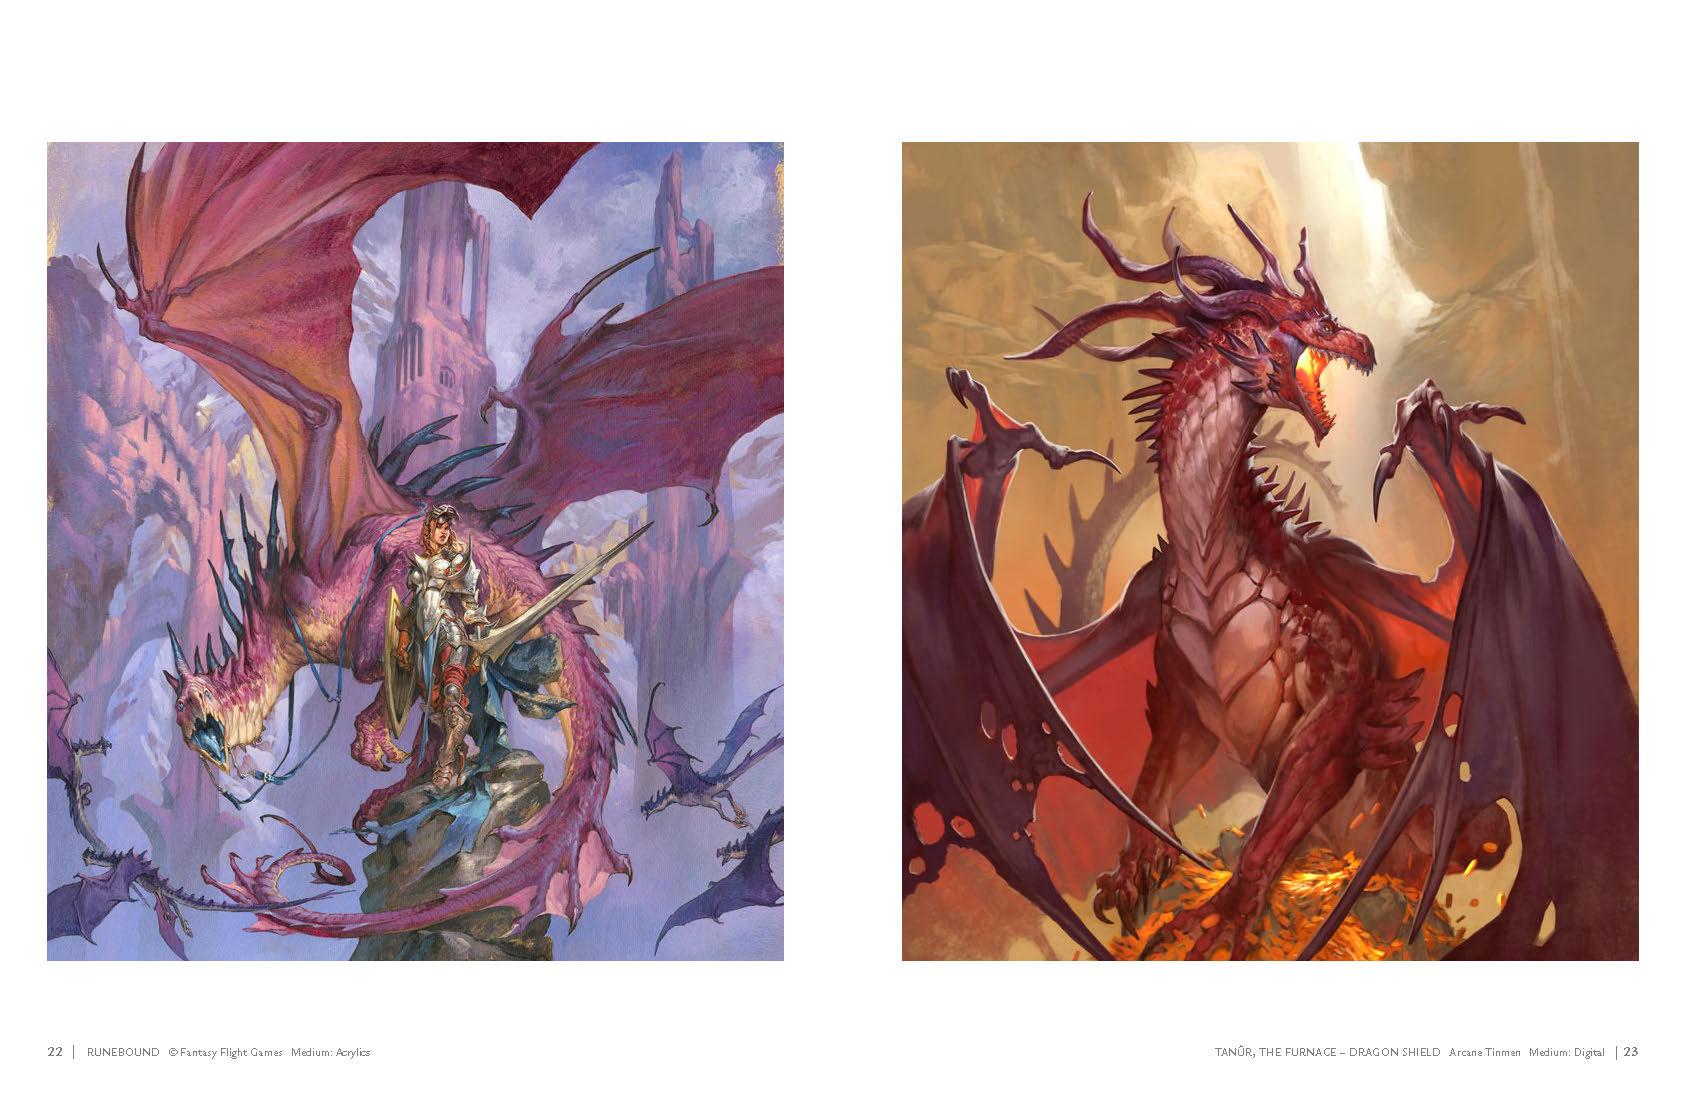 Jesper Ejsin, Elsewhere, Runebound / Dragonshield